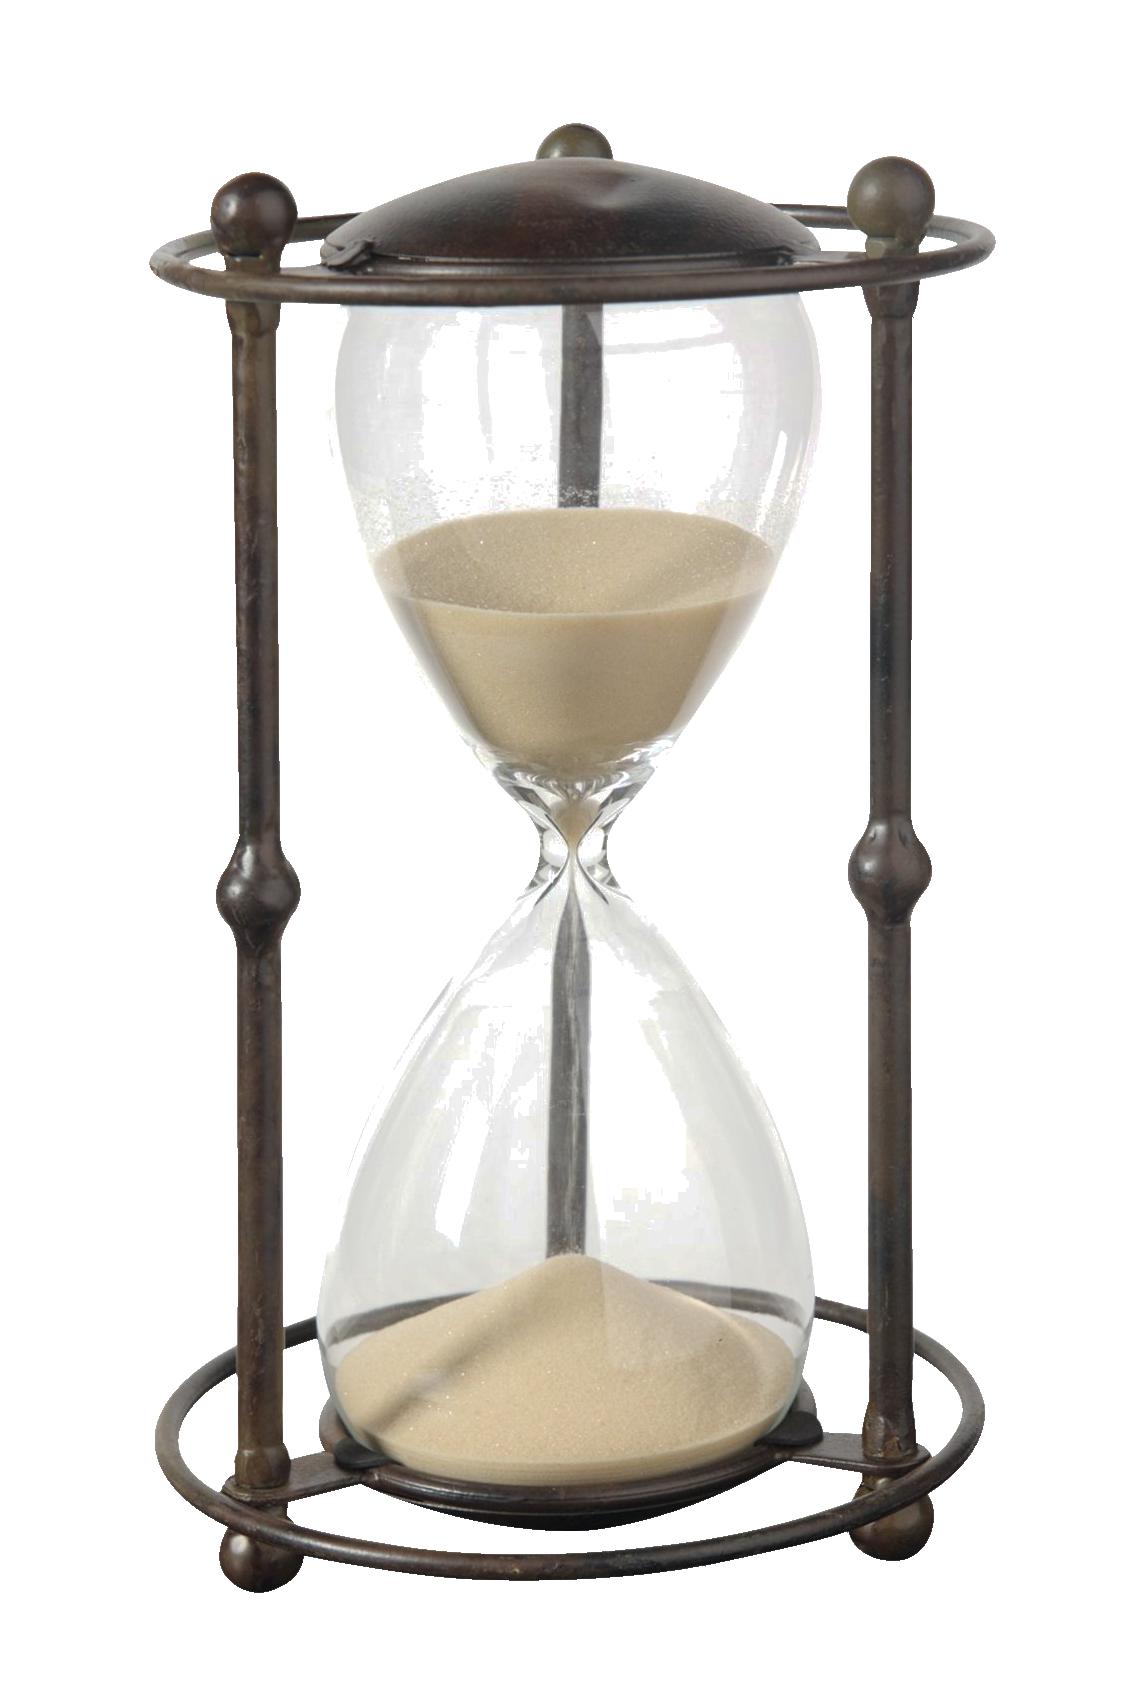 PNGPIX-COM-Hourglass-PNG-Transparent-Image.png - Hourglass PNG HD